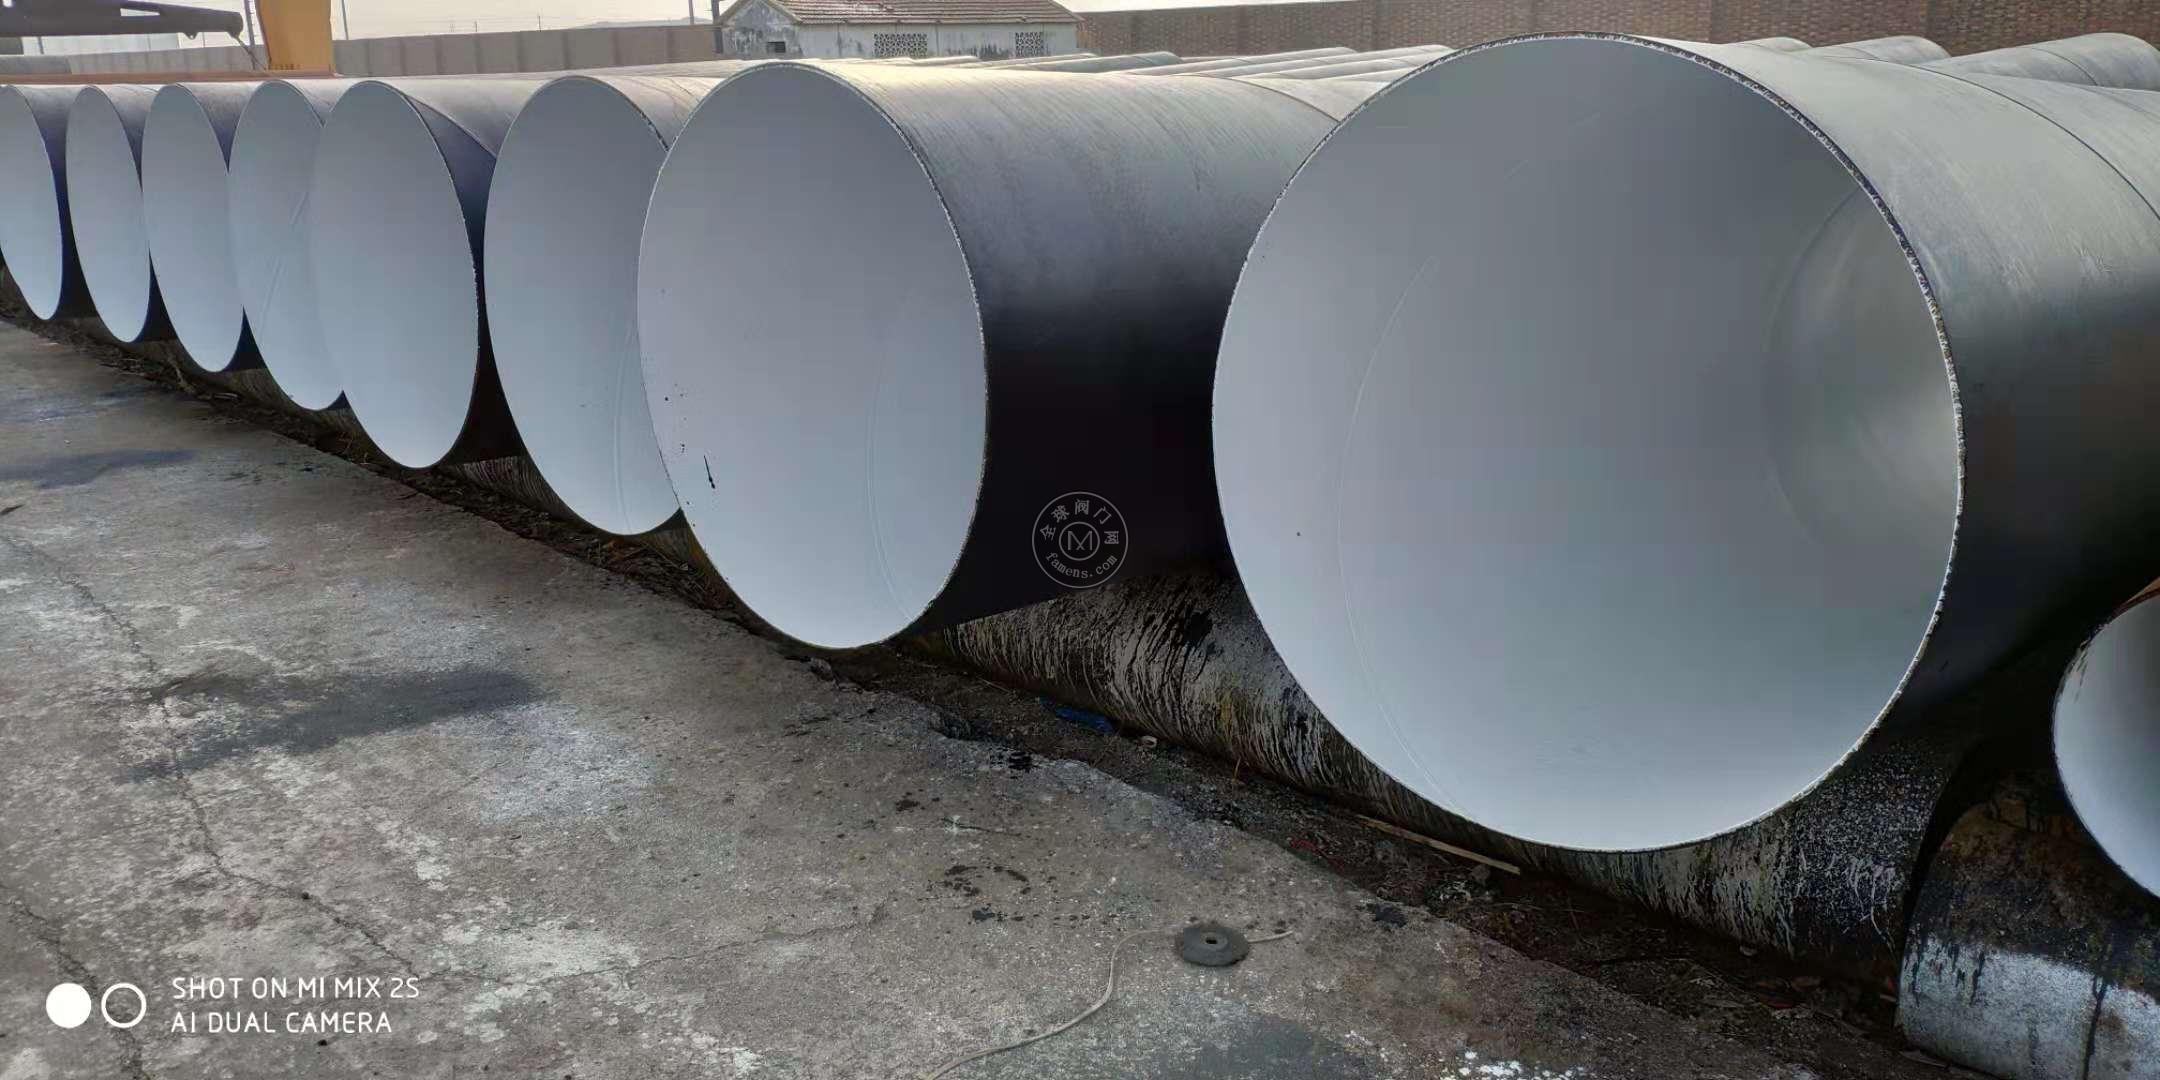 ipn8710饮水管道 3pe防腐螺旋管饮水管道